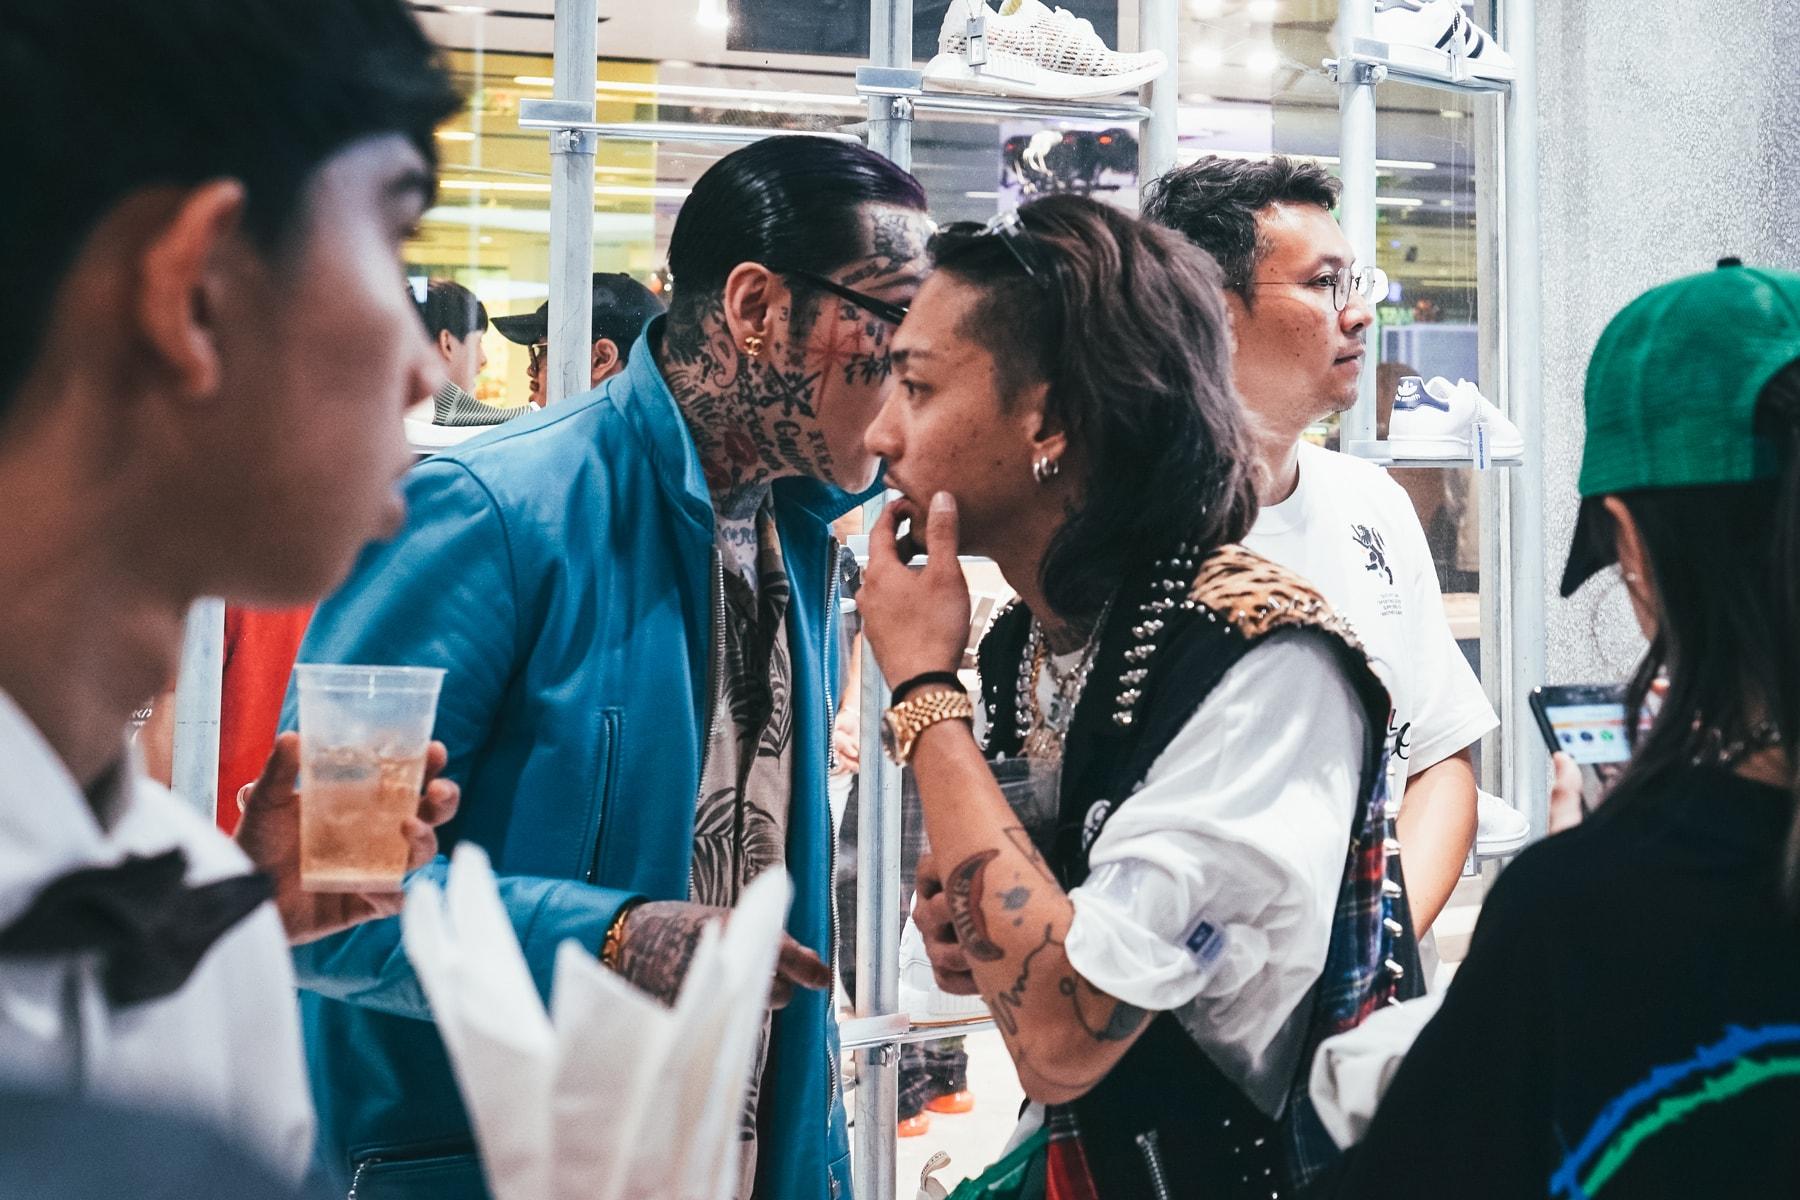 UPPERGROUND CentralWorld Flagship Opening Recap Thailand Bangkok Streetwear Street Fashion Carnival FR2 YIB Youths in Balaclava Chaotic Surf is Dead Takara Wong Poliquant Magic Stick Blackbarrett WVS Indigoskin SSAP